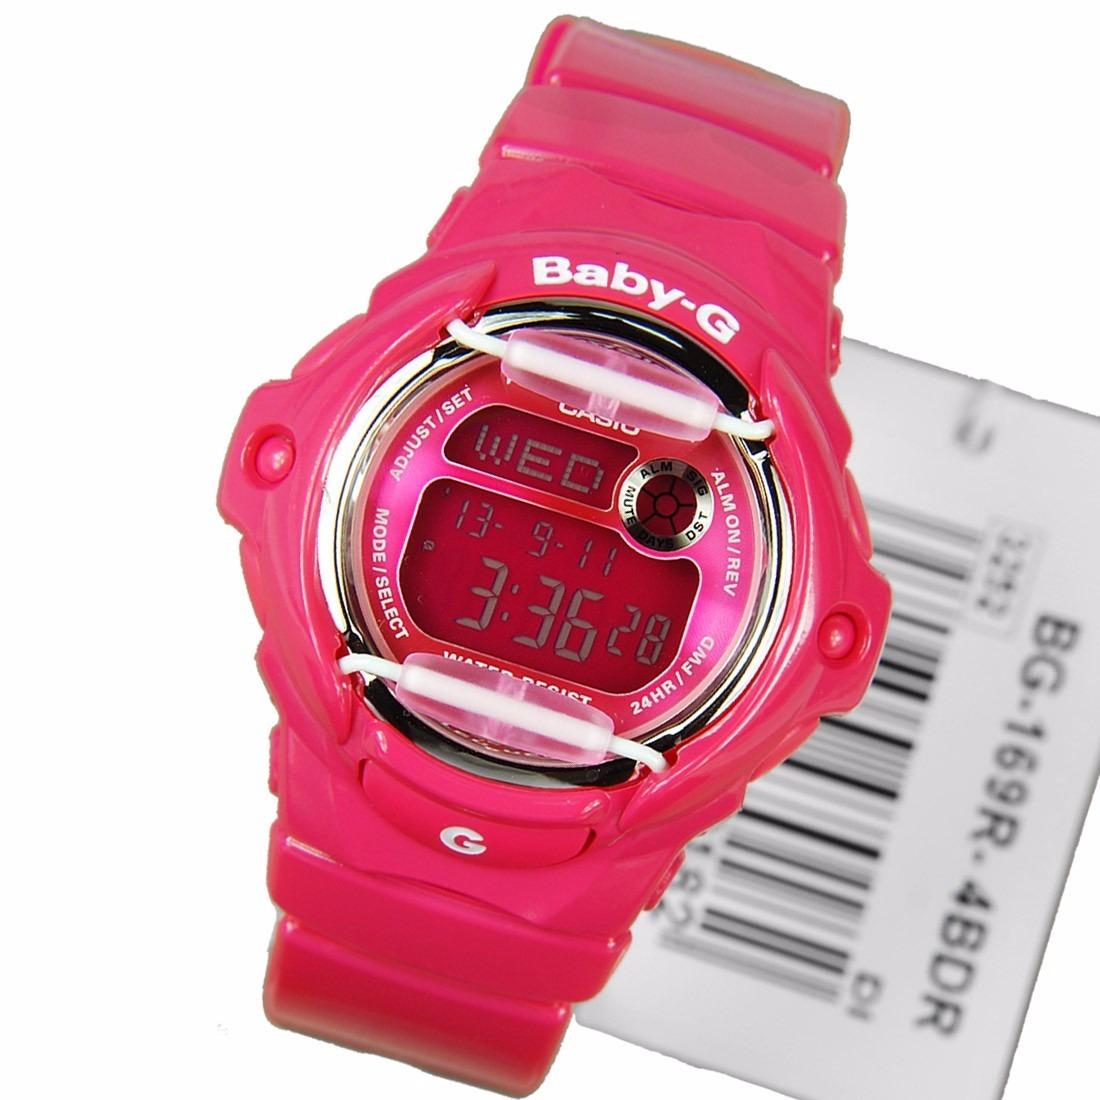 845f0850c0f Relogio Casio Baby G Bg169r Rosa G Shock 200 Mts Original